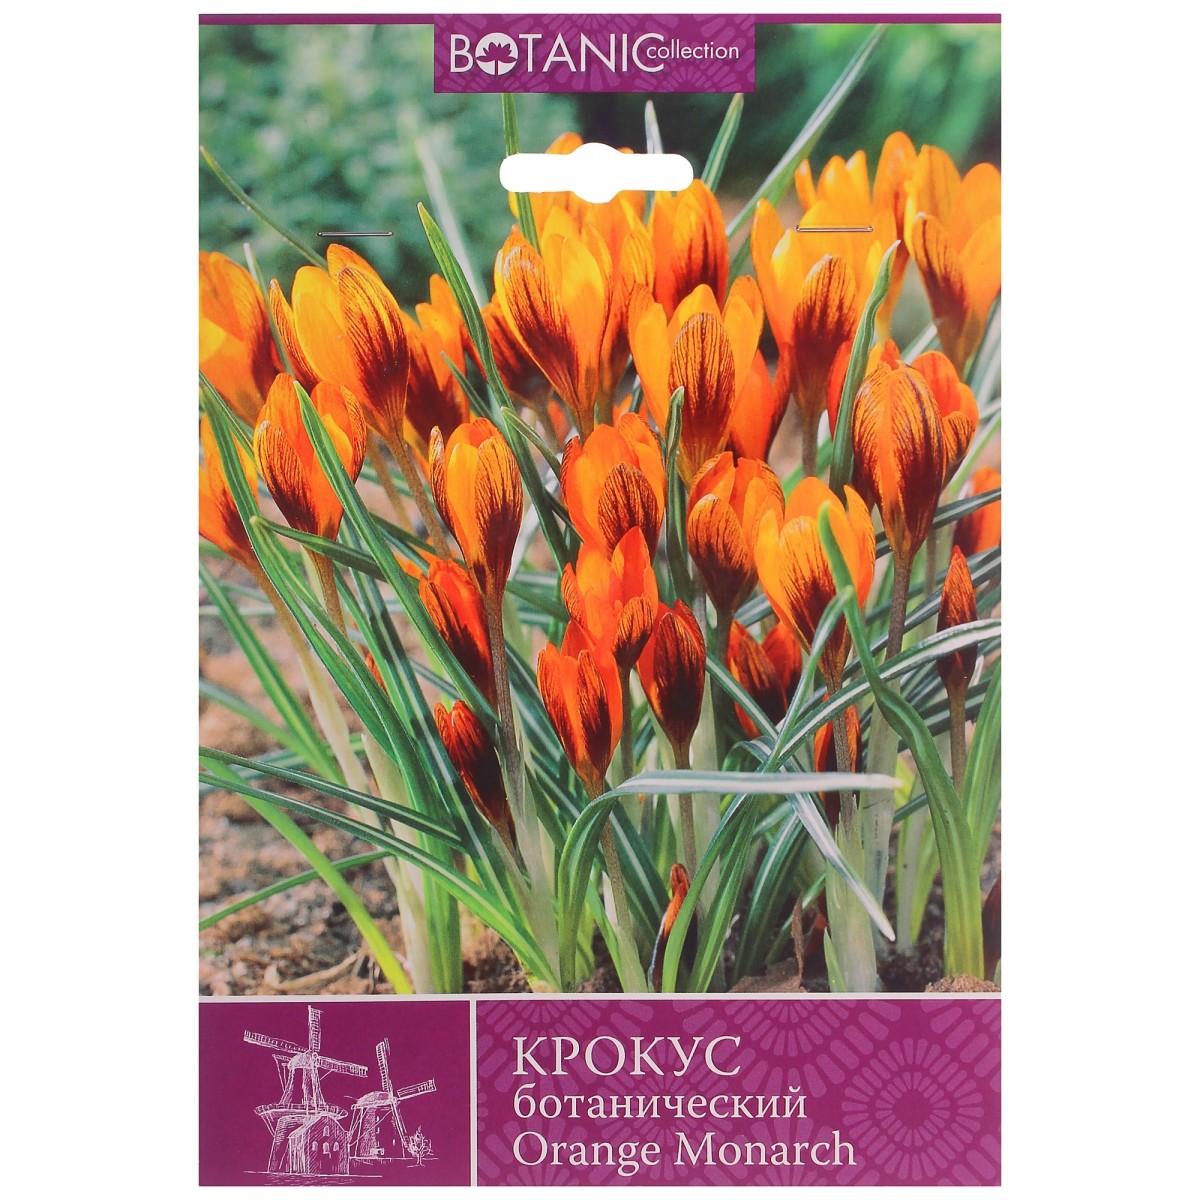 Крокус Ботанический Оранж Монарх